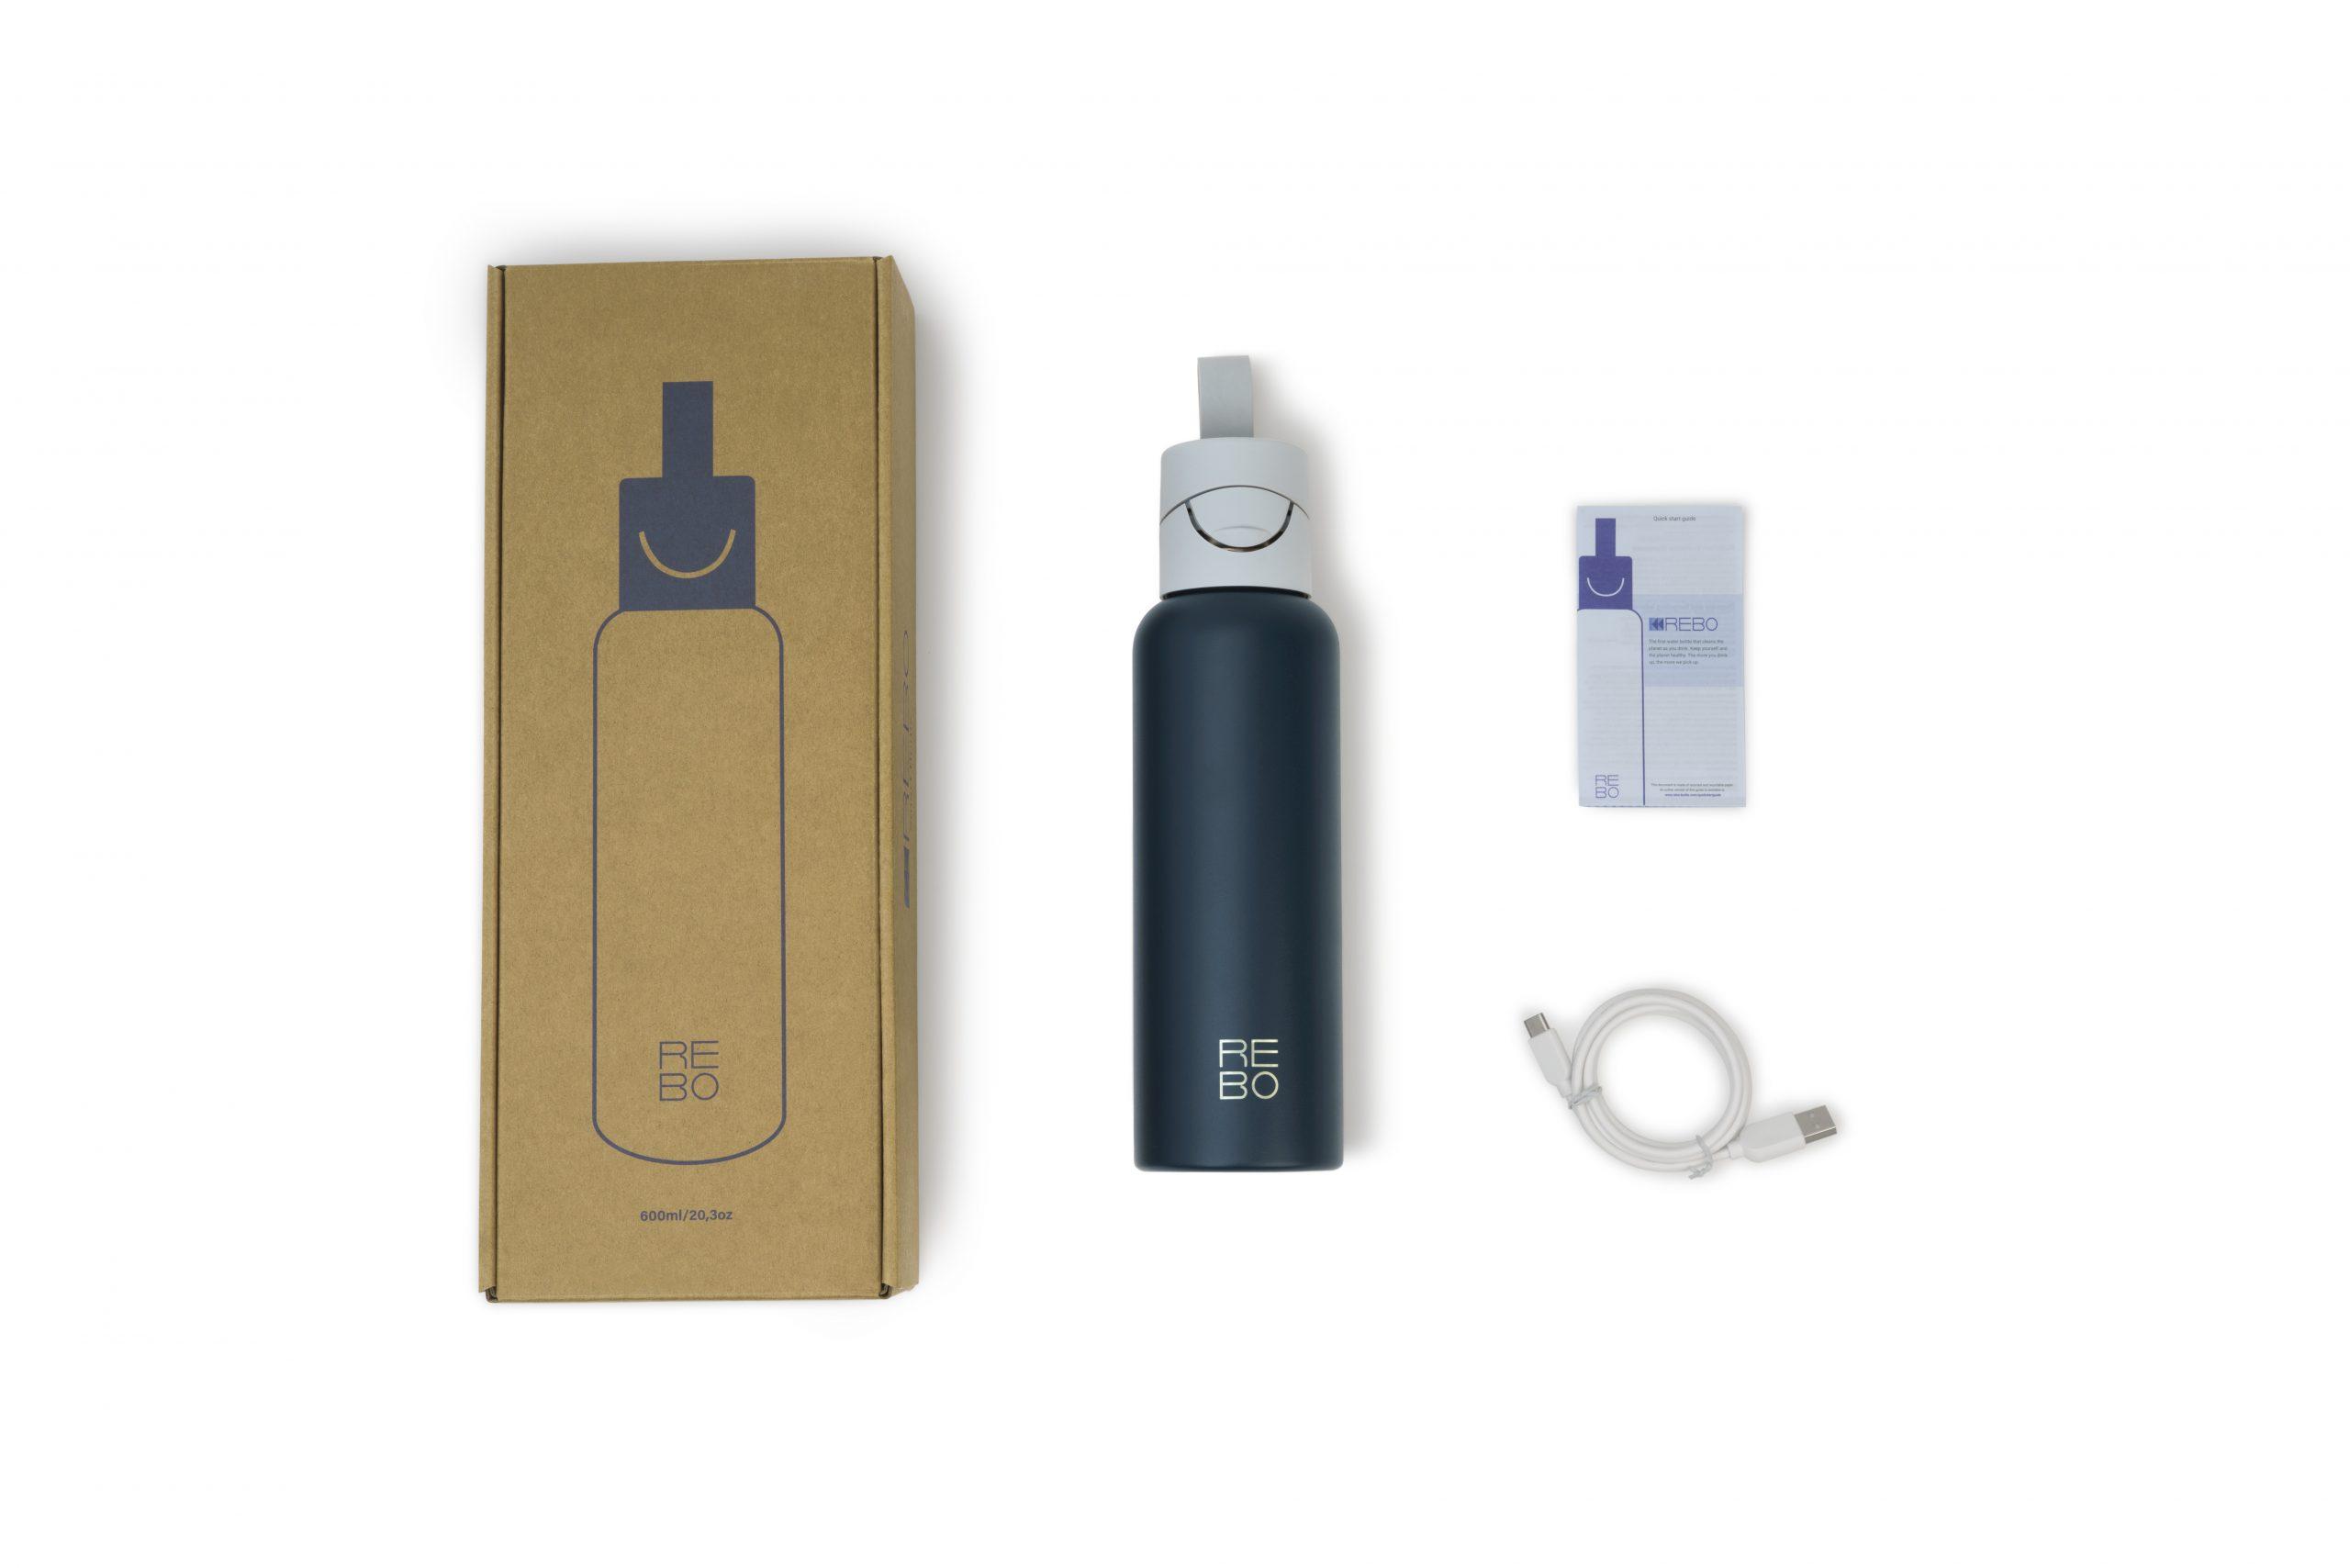 rebo product photography limbo bottle flatpicture blue scaled